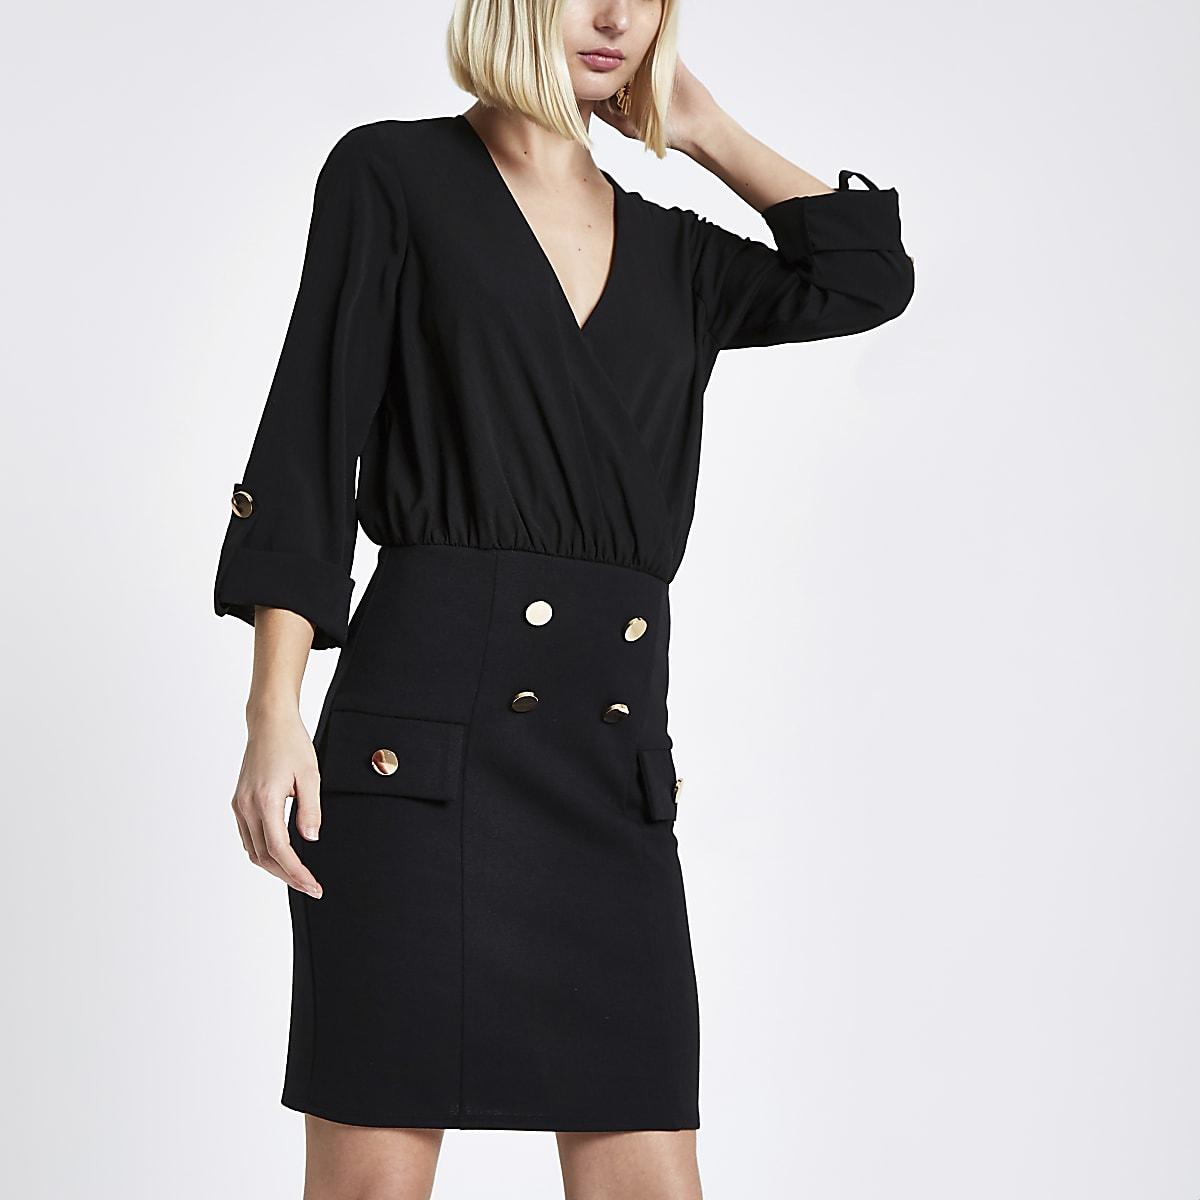 Black shirt and button mini dress